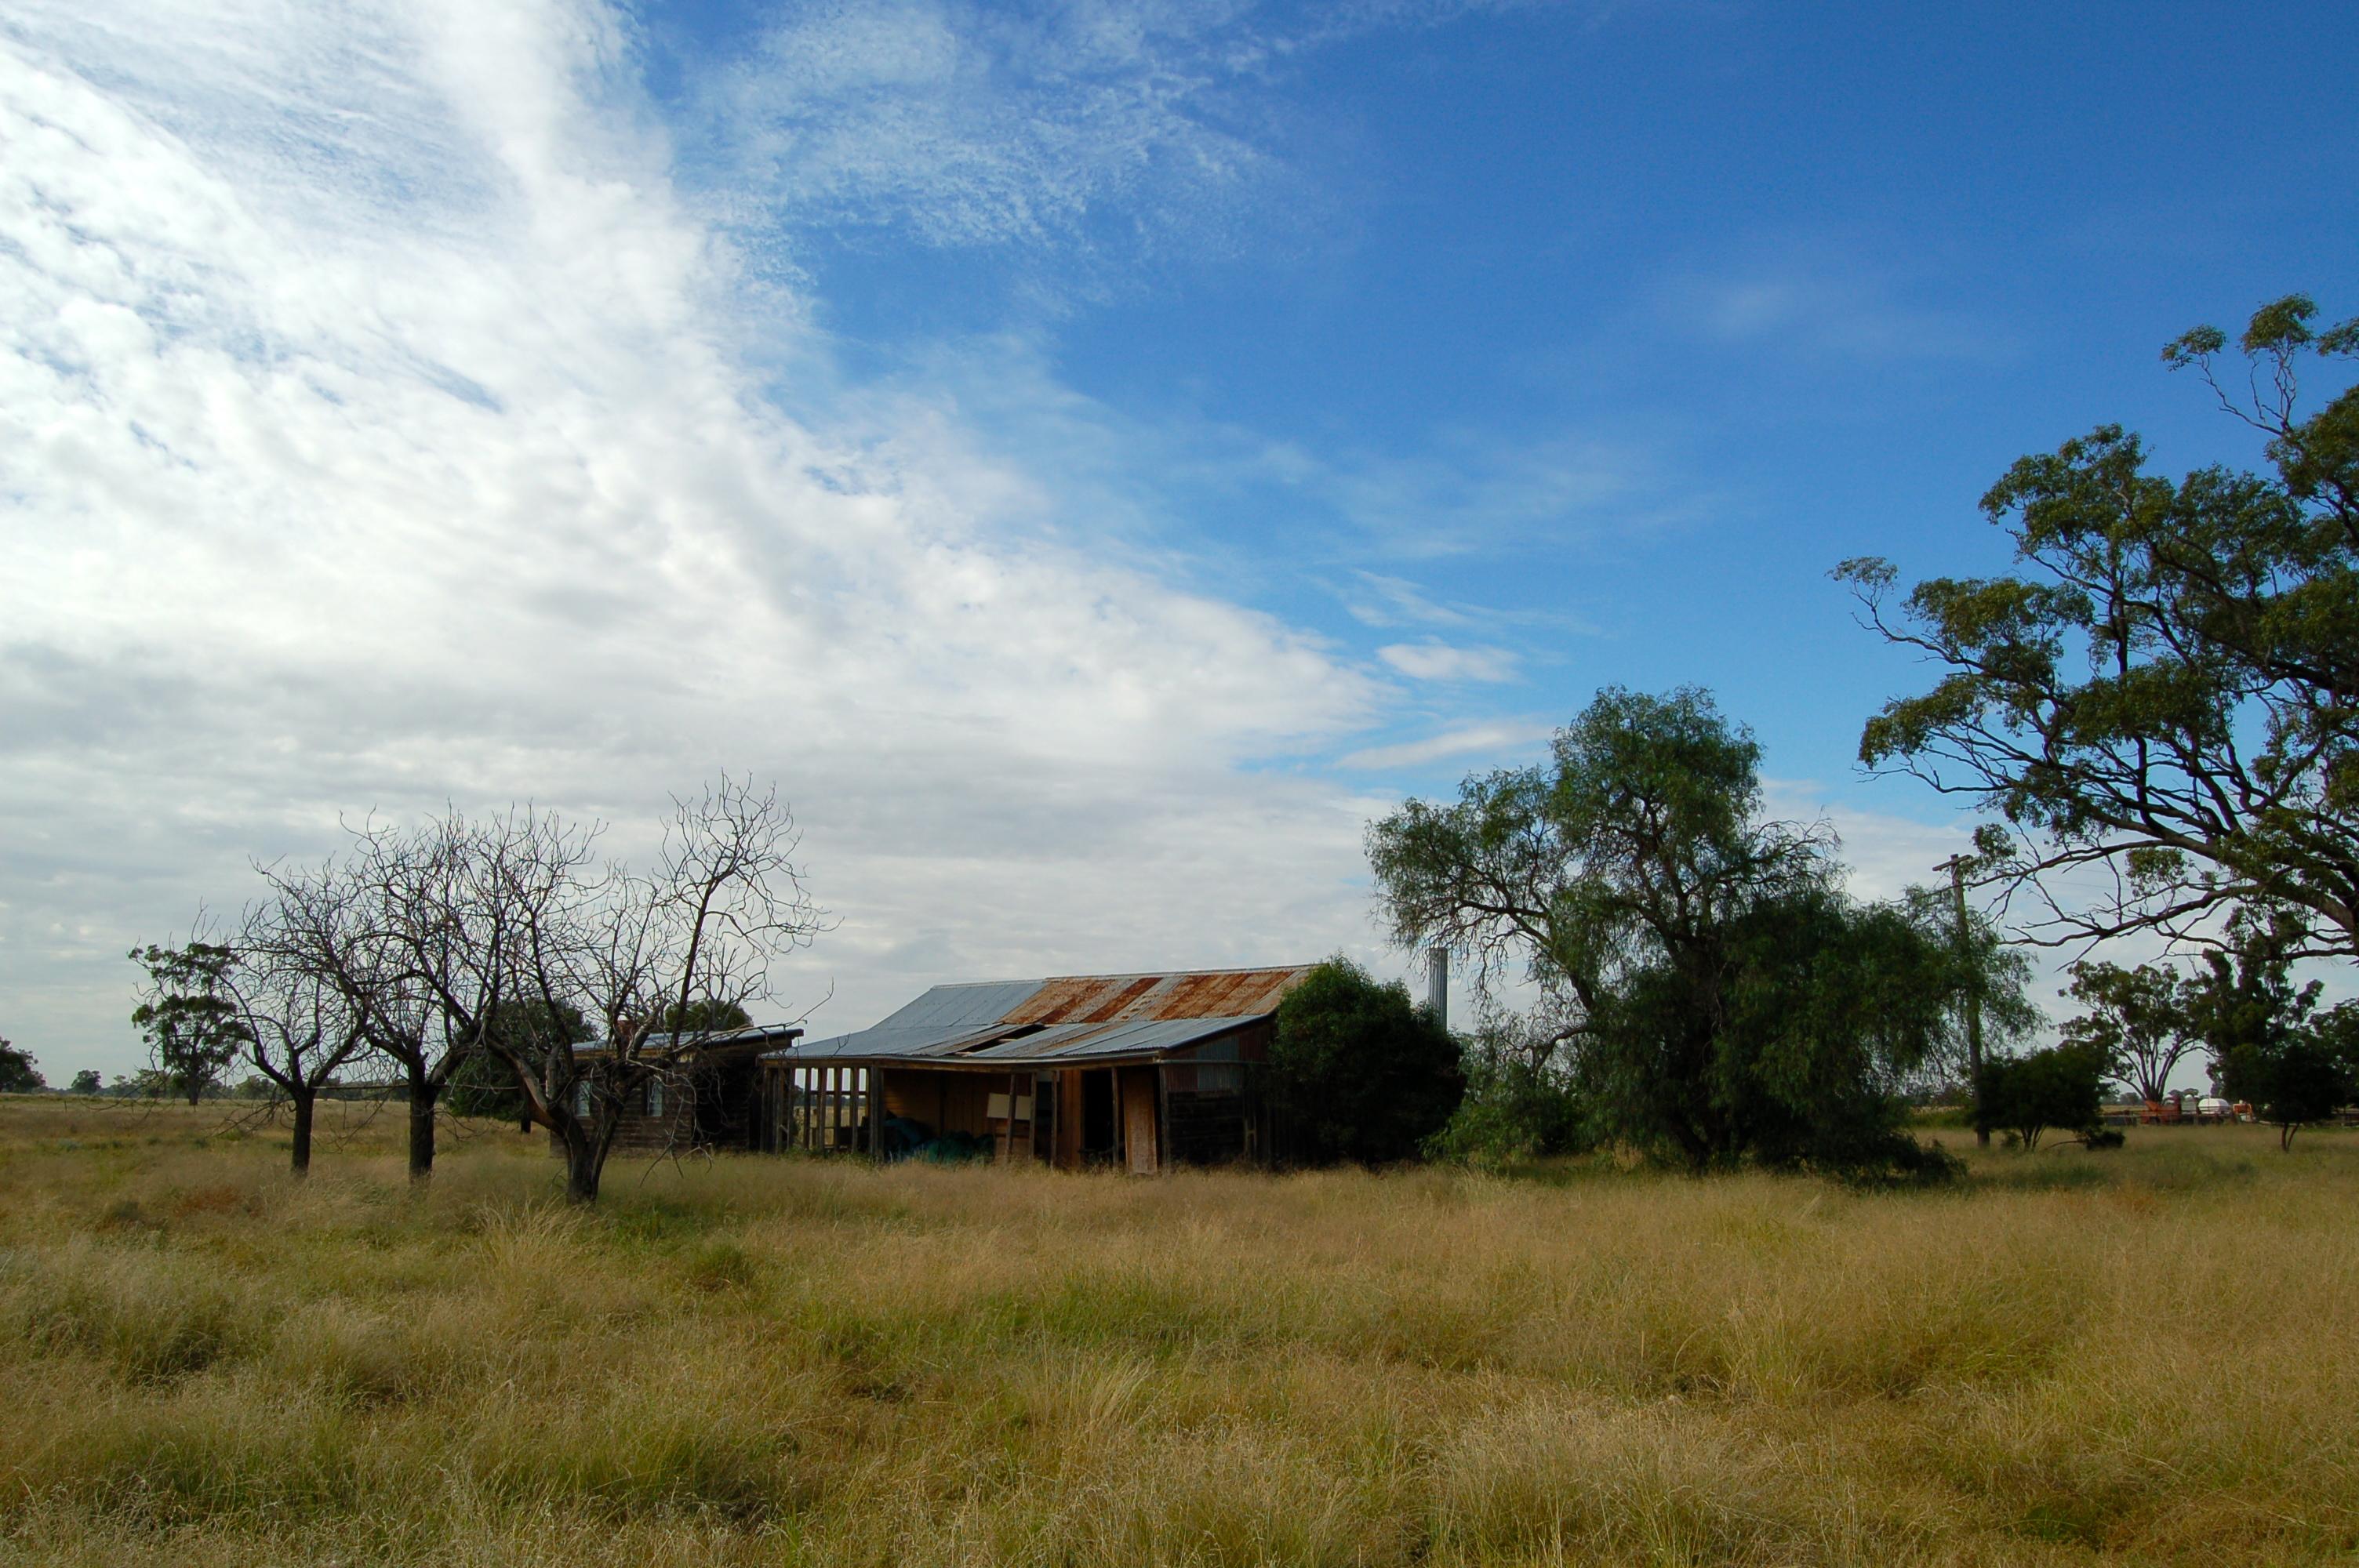 Grasslands of the Western Plains (Outback Australia)